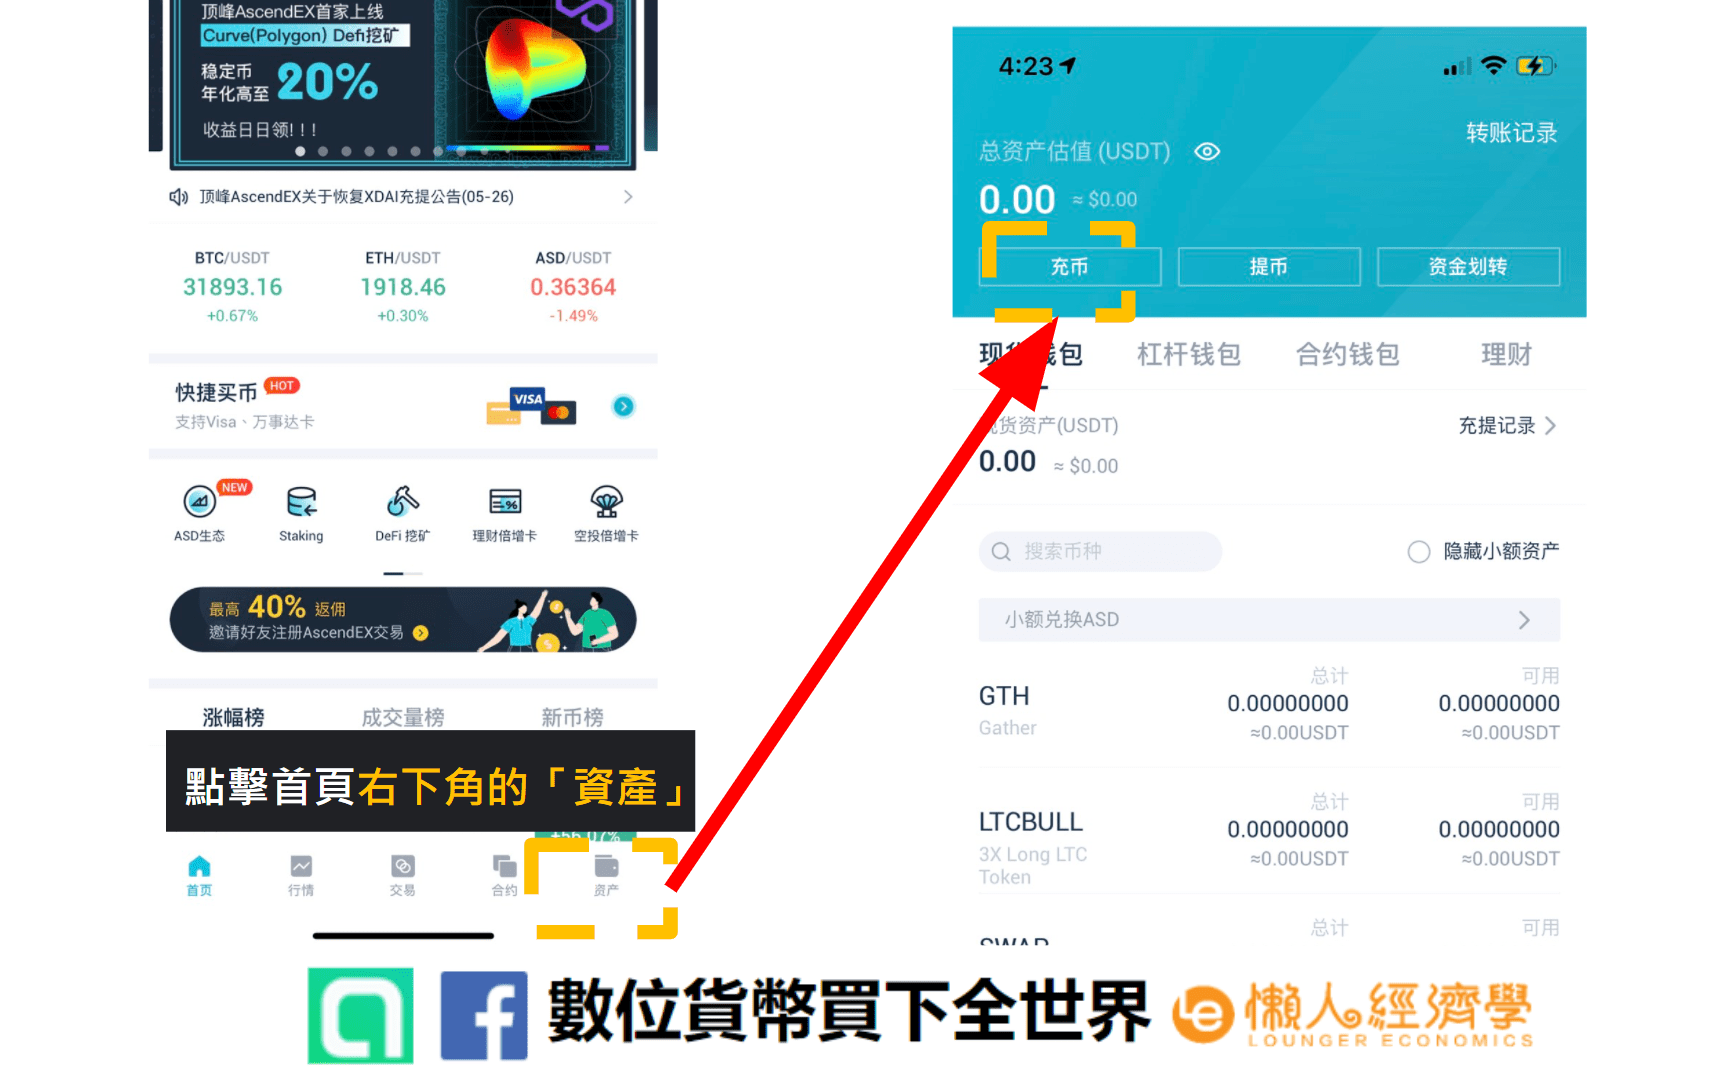 AscendEX錢包入金教學:點擊AscendEX app首頁右下方的「資產」,進入充幣頁面